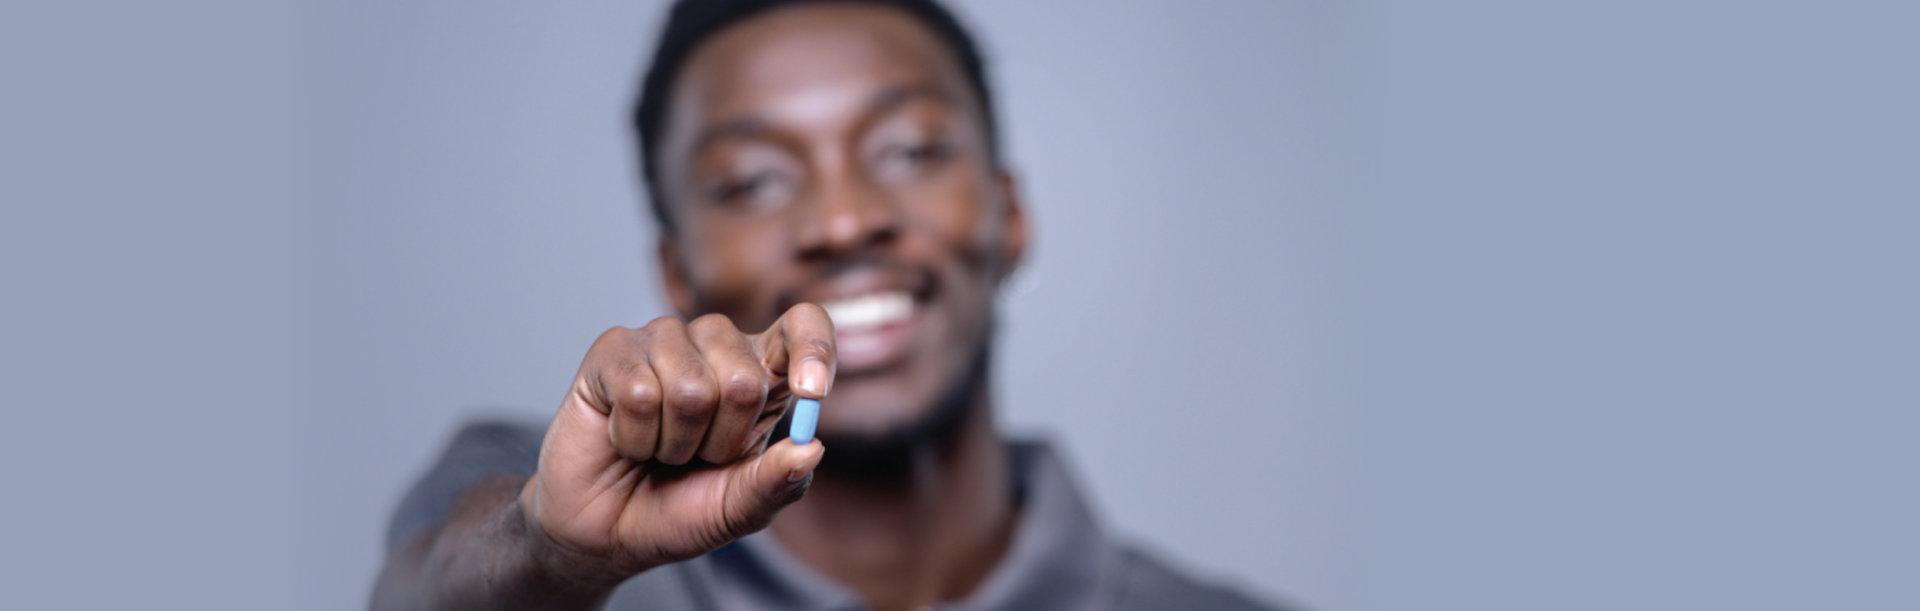 adult man holding a pill